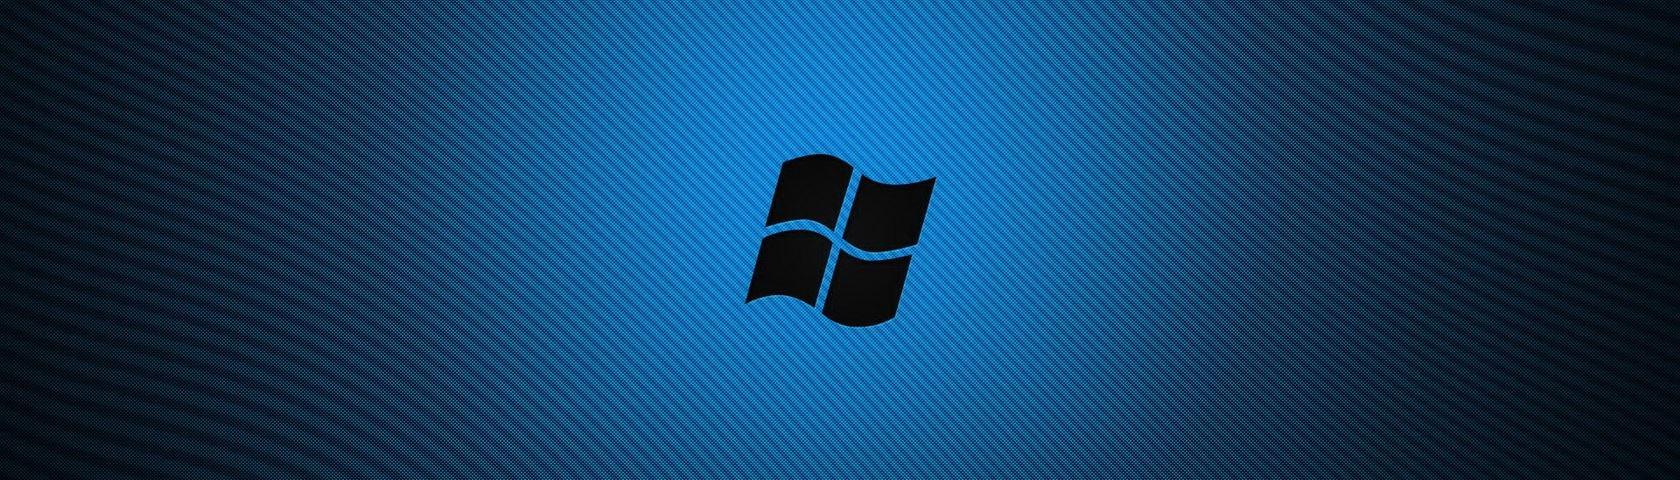 Blue Wave Windows